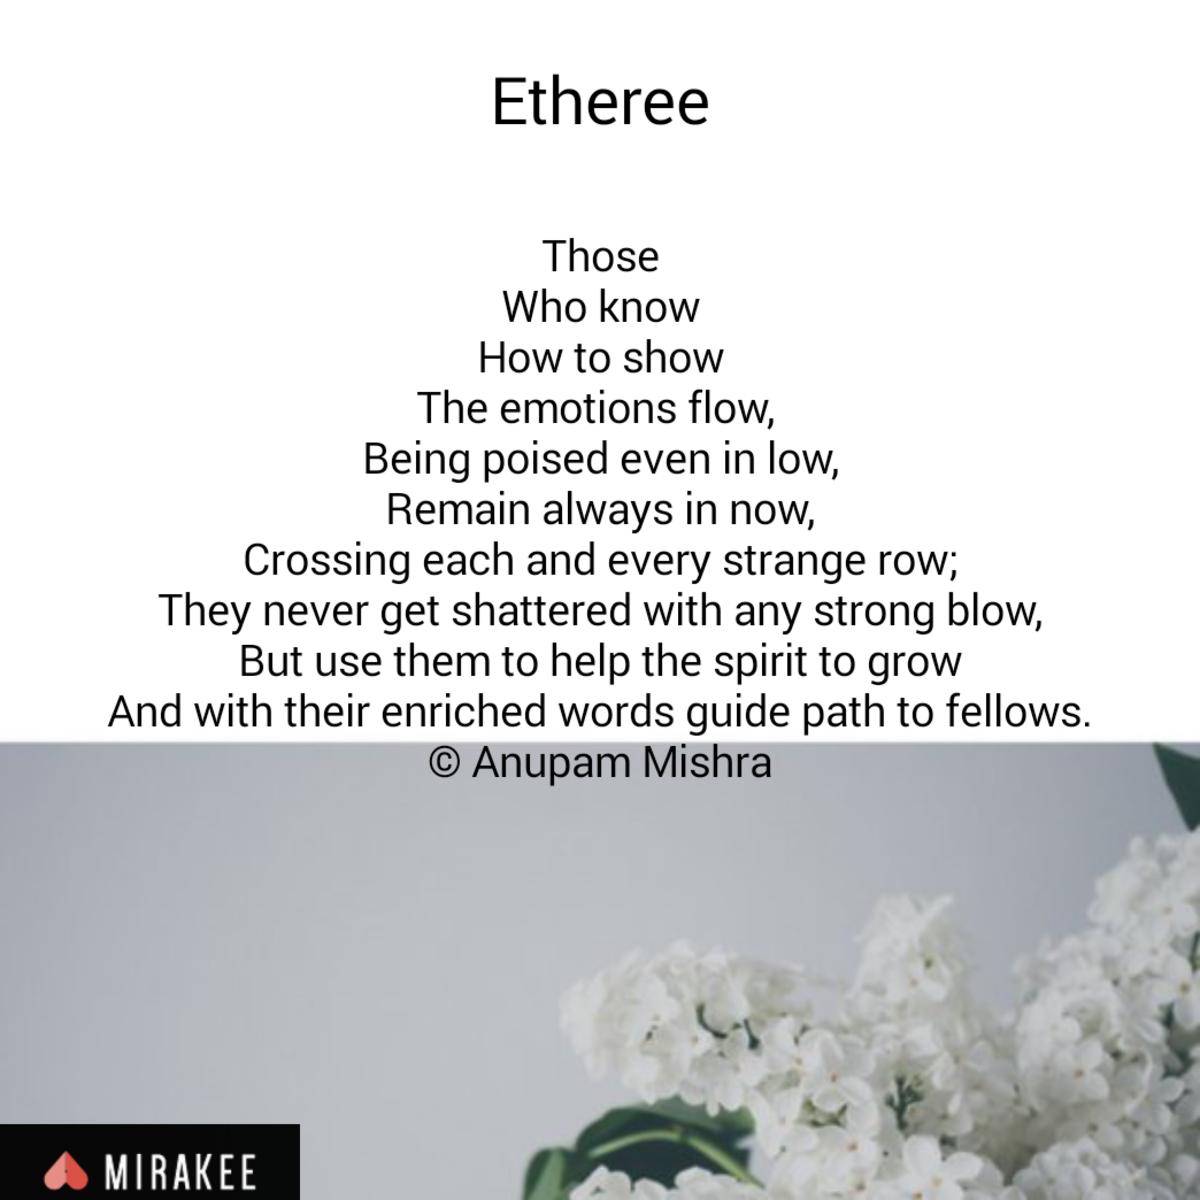 Etheree